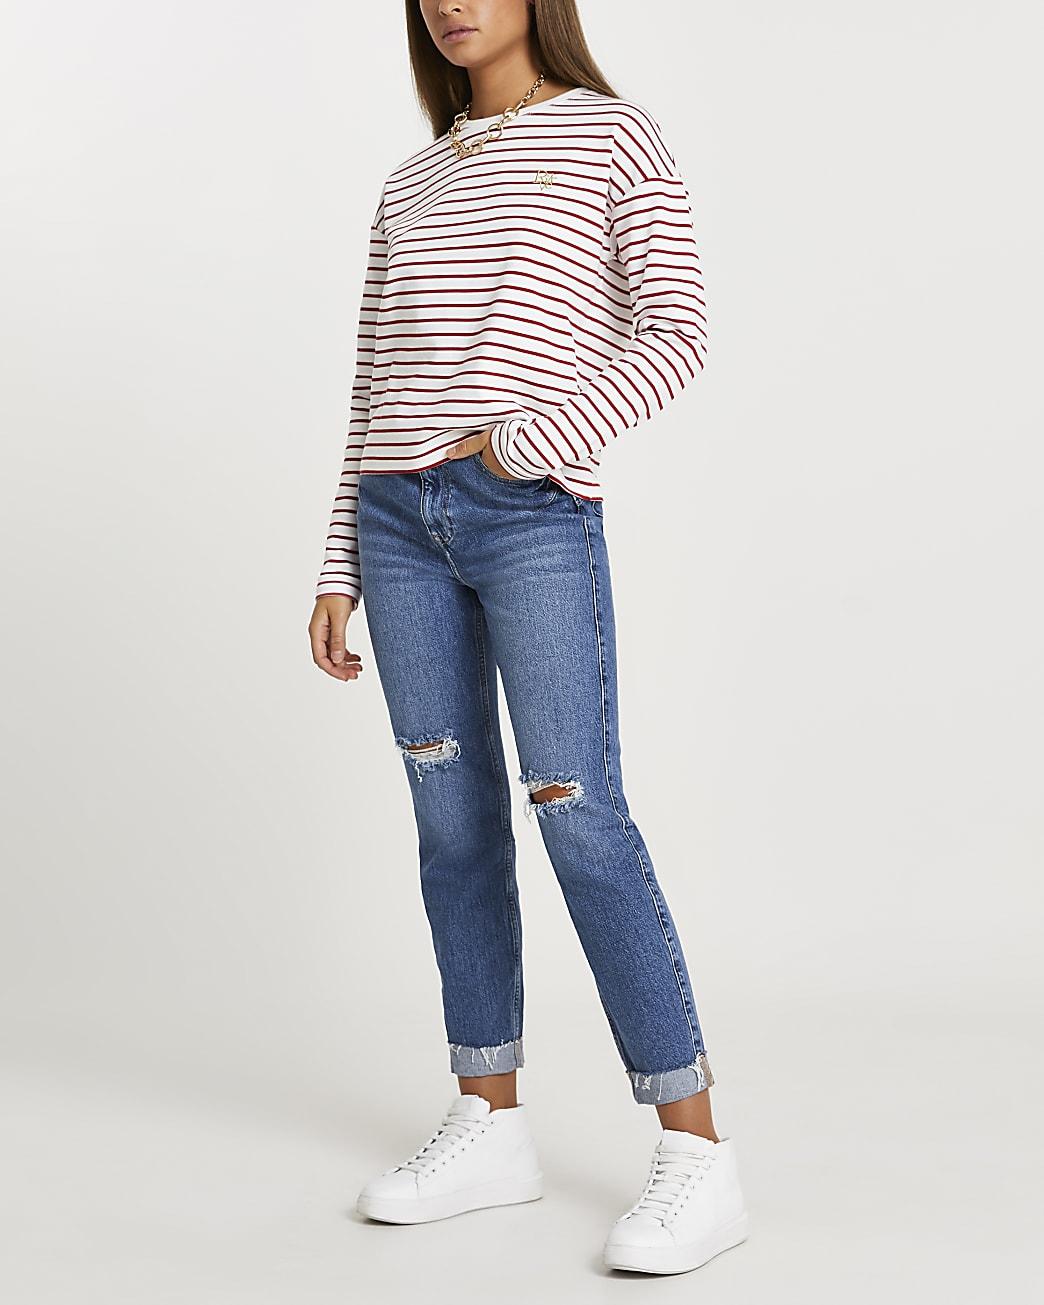 Red stripe long sleeve top